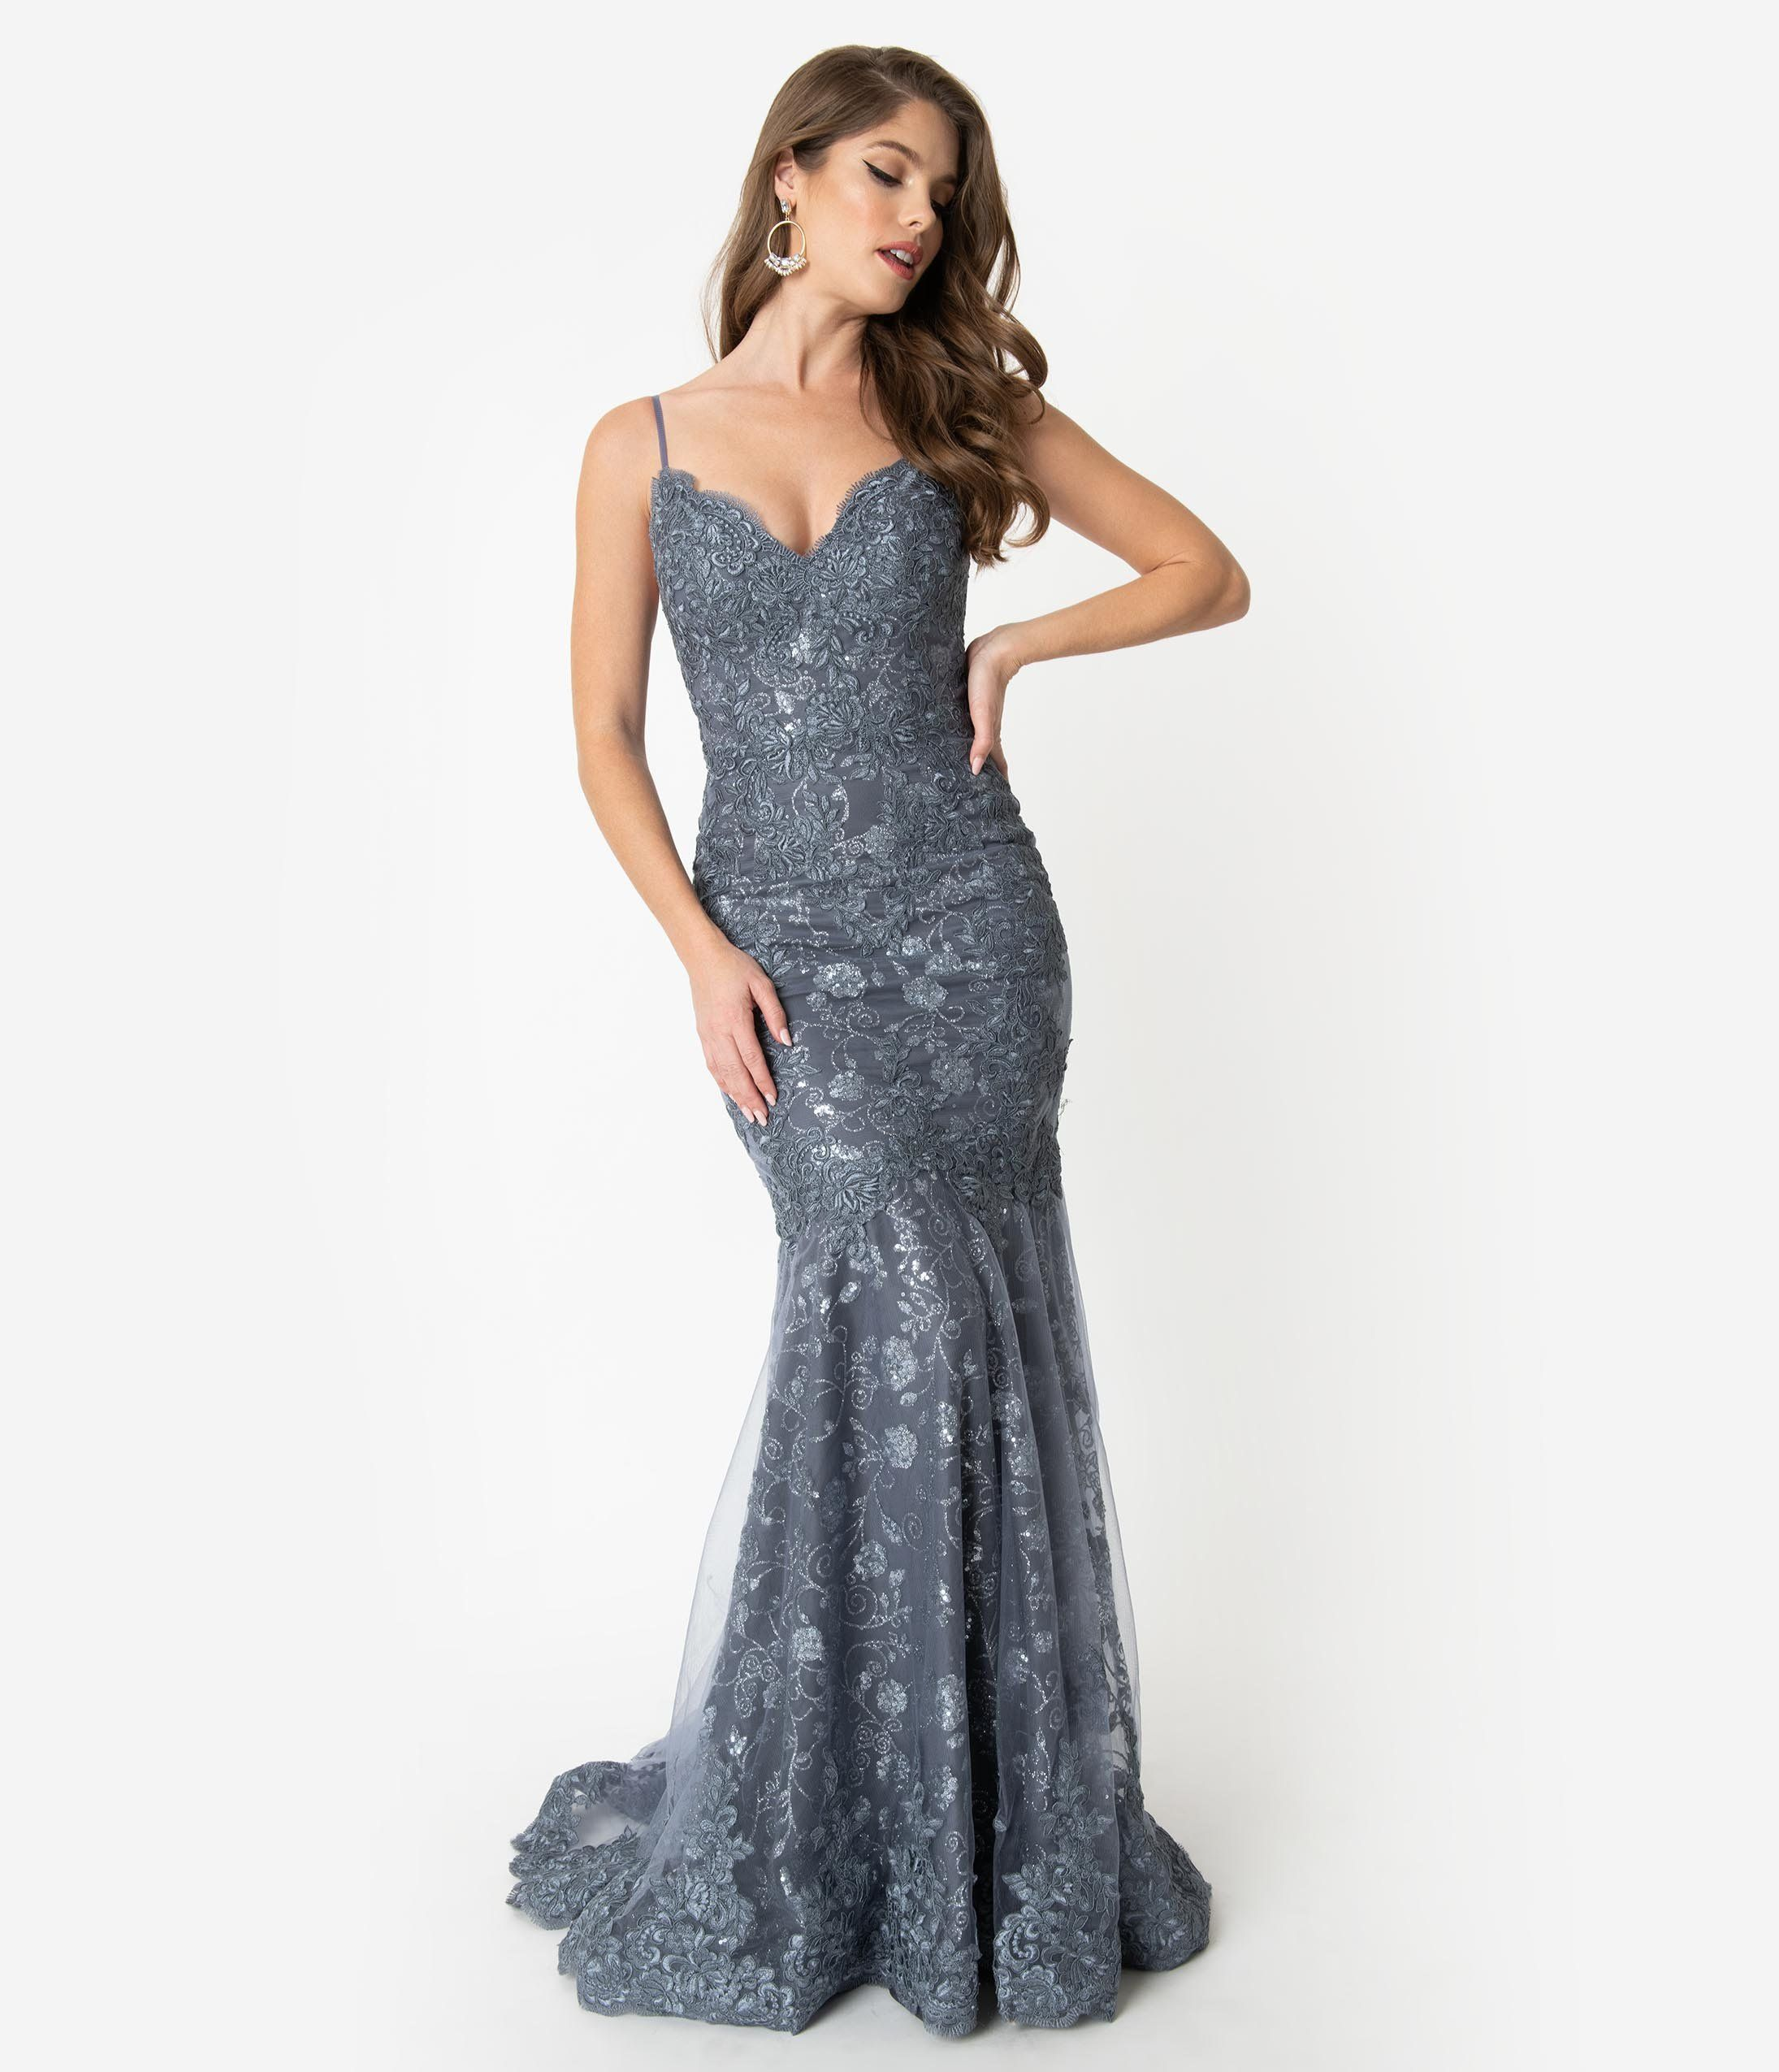 1930s Evening Dress Art Deco Gown Party Dress 1930s Dress Evening Art Deco Gown Hollywood Gowns [ 2550 x 2190 Pixel ]